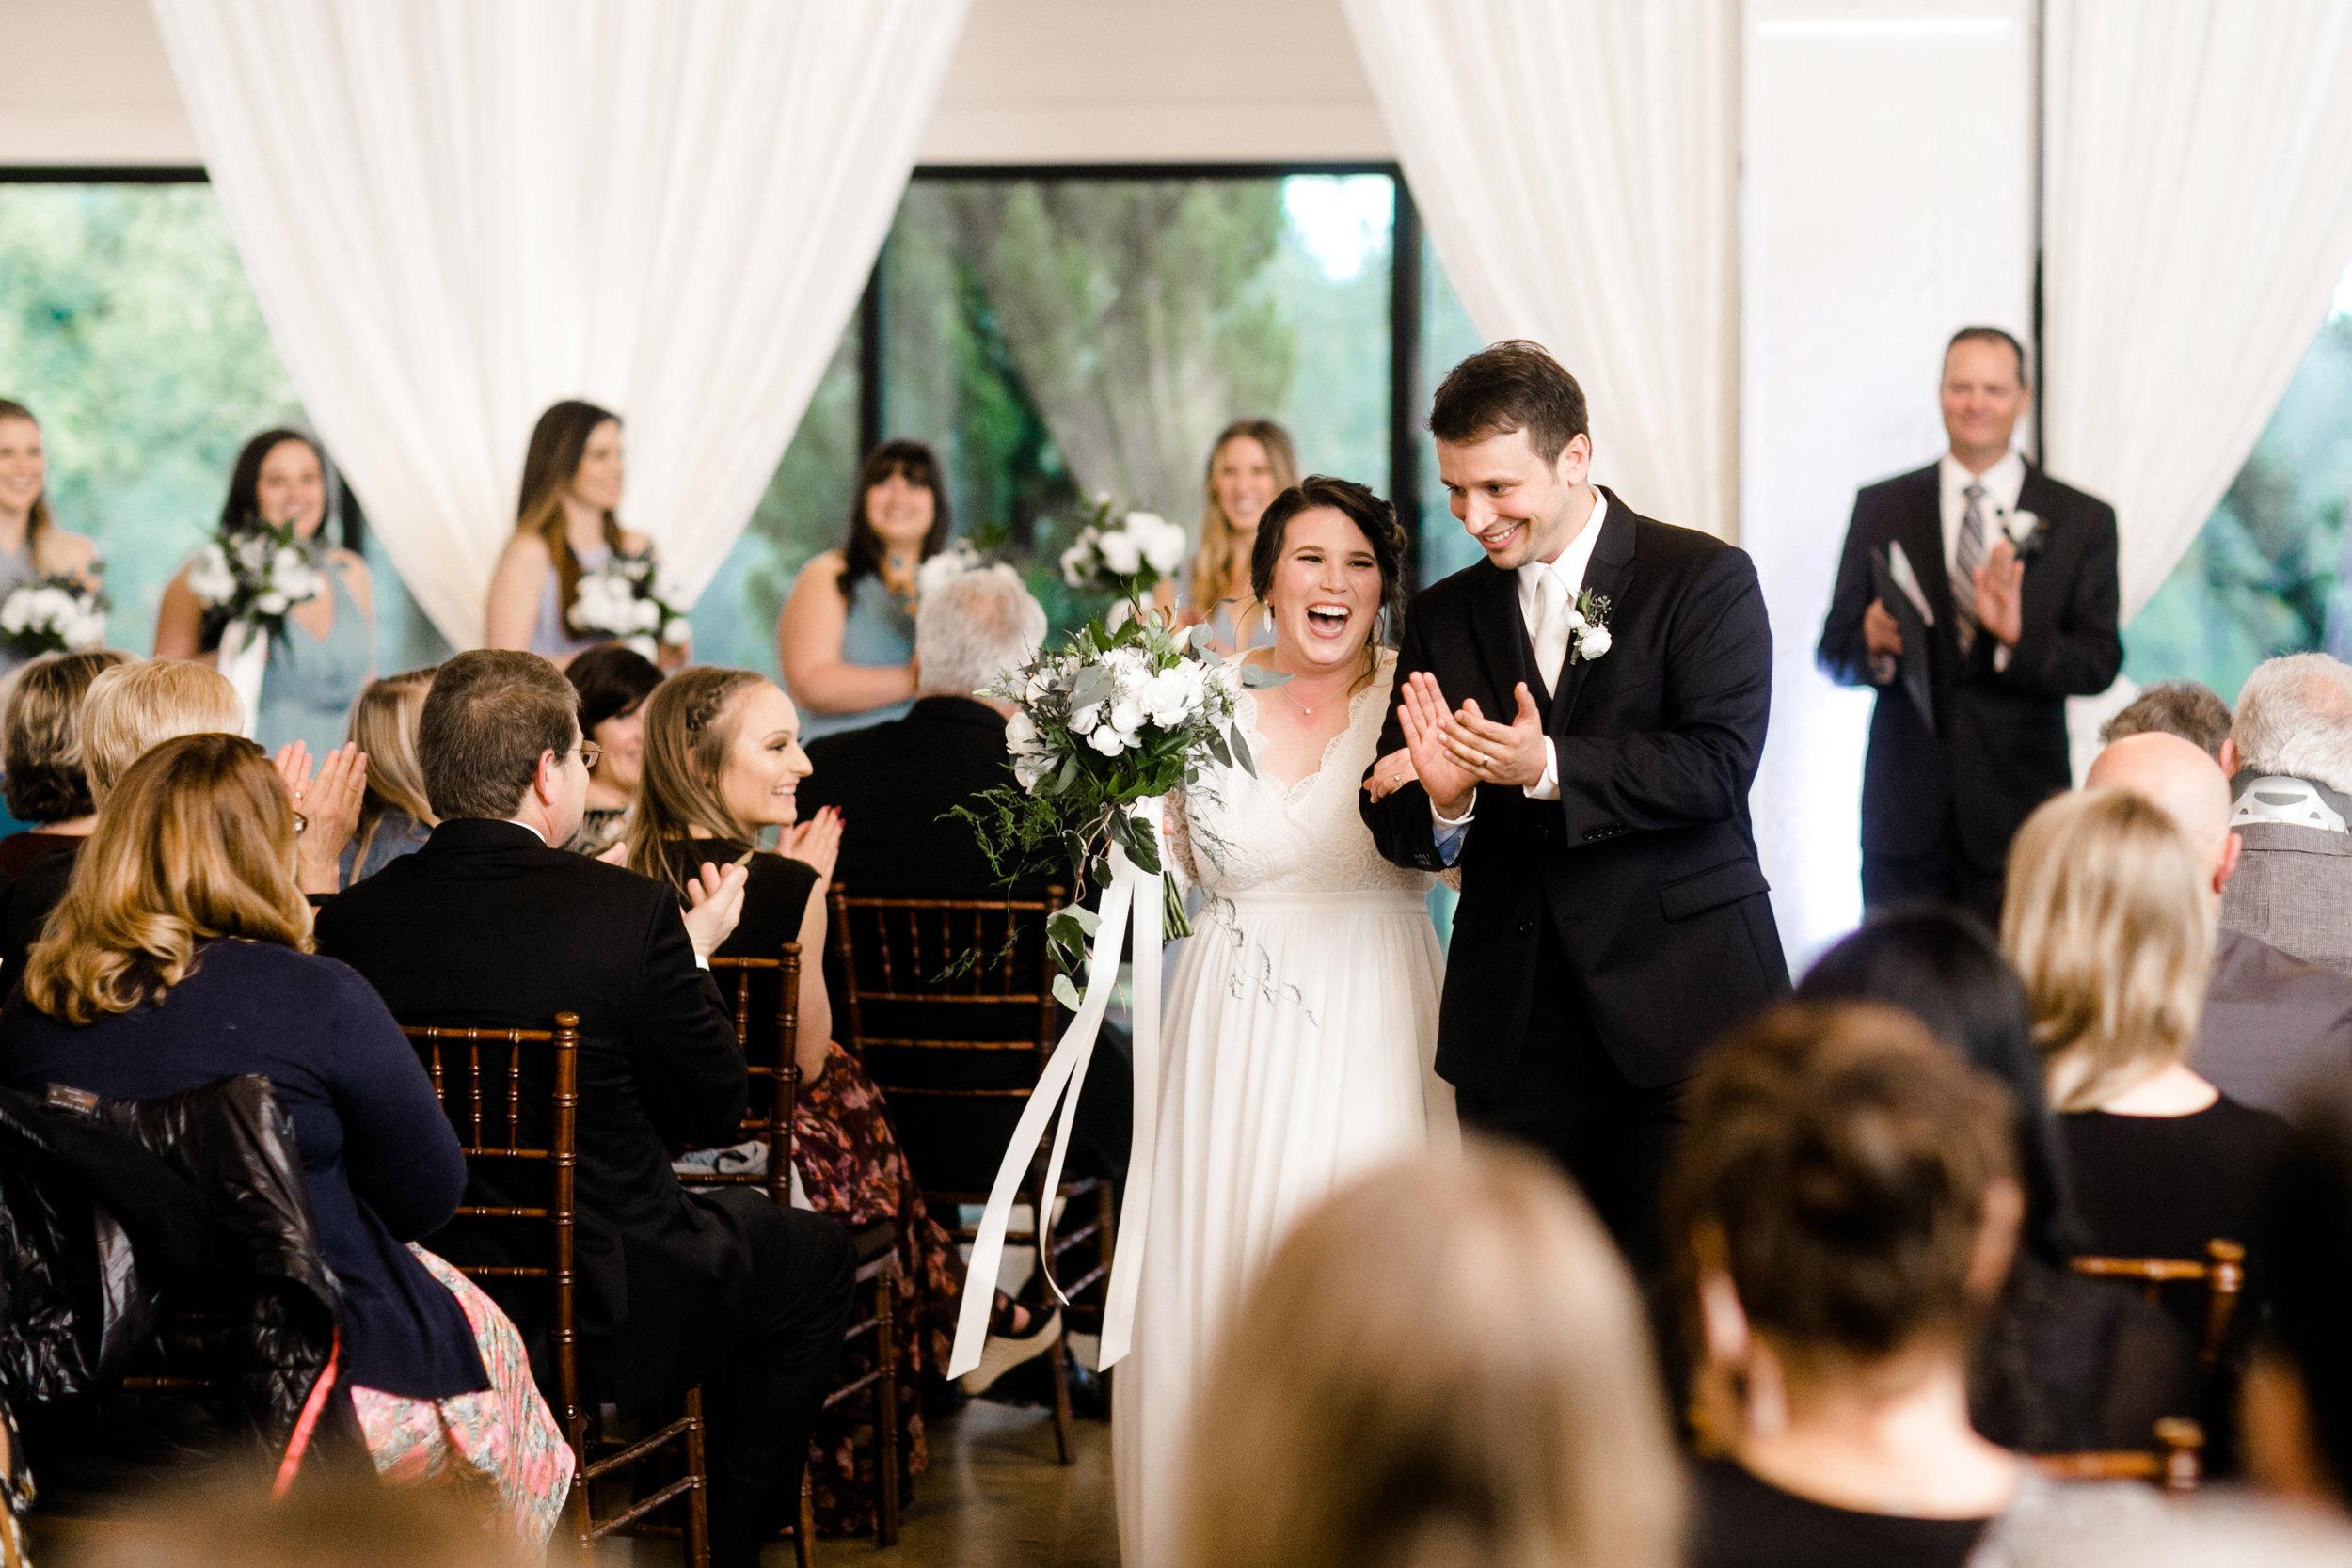 Austin_Texas_Fine_Art_Wedding_Photographer_Kayla_Snell_Photography_Antebellum_Oaks491.jpg